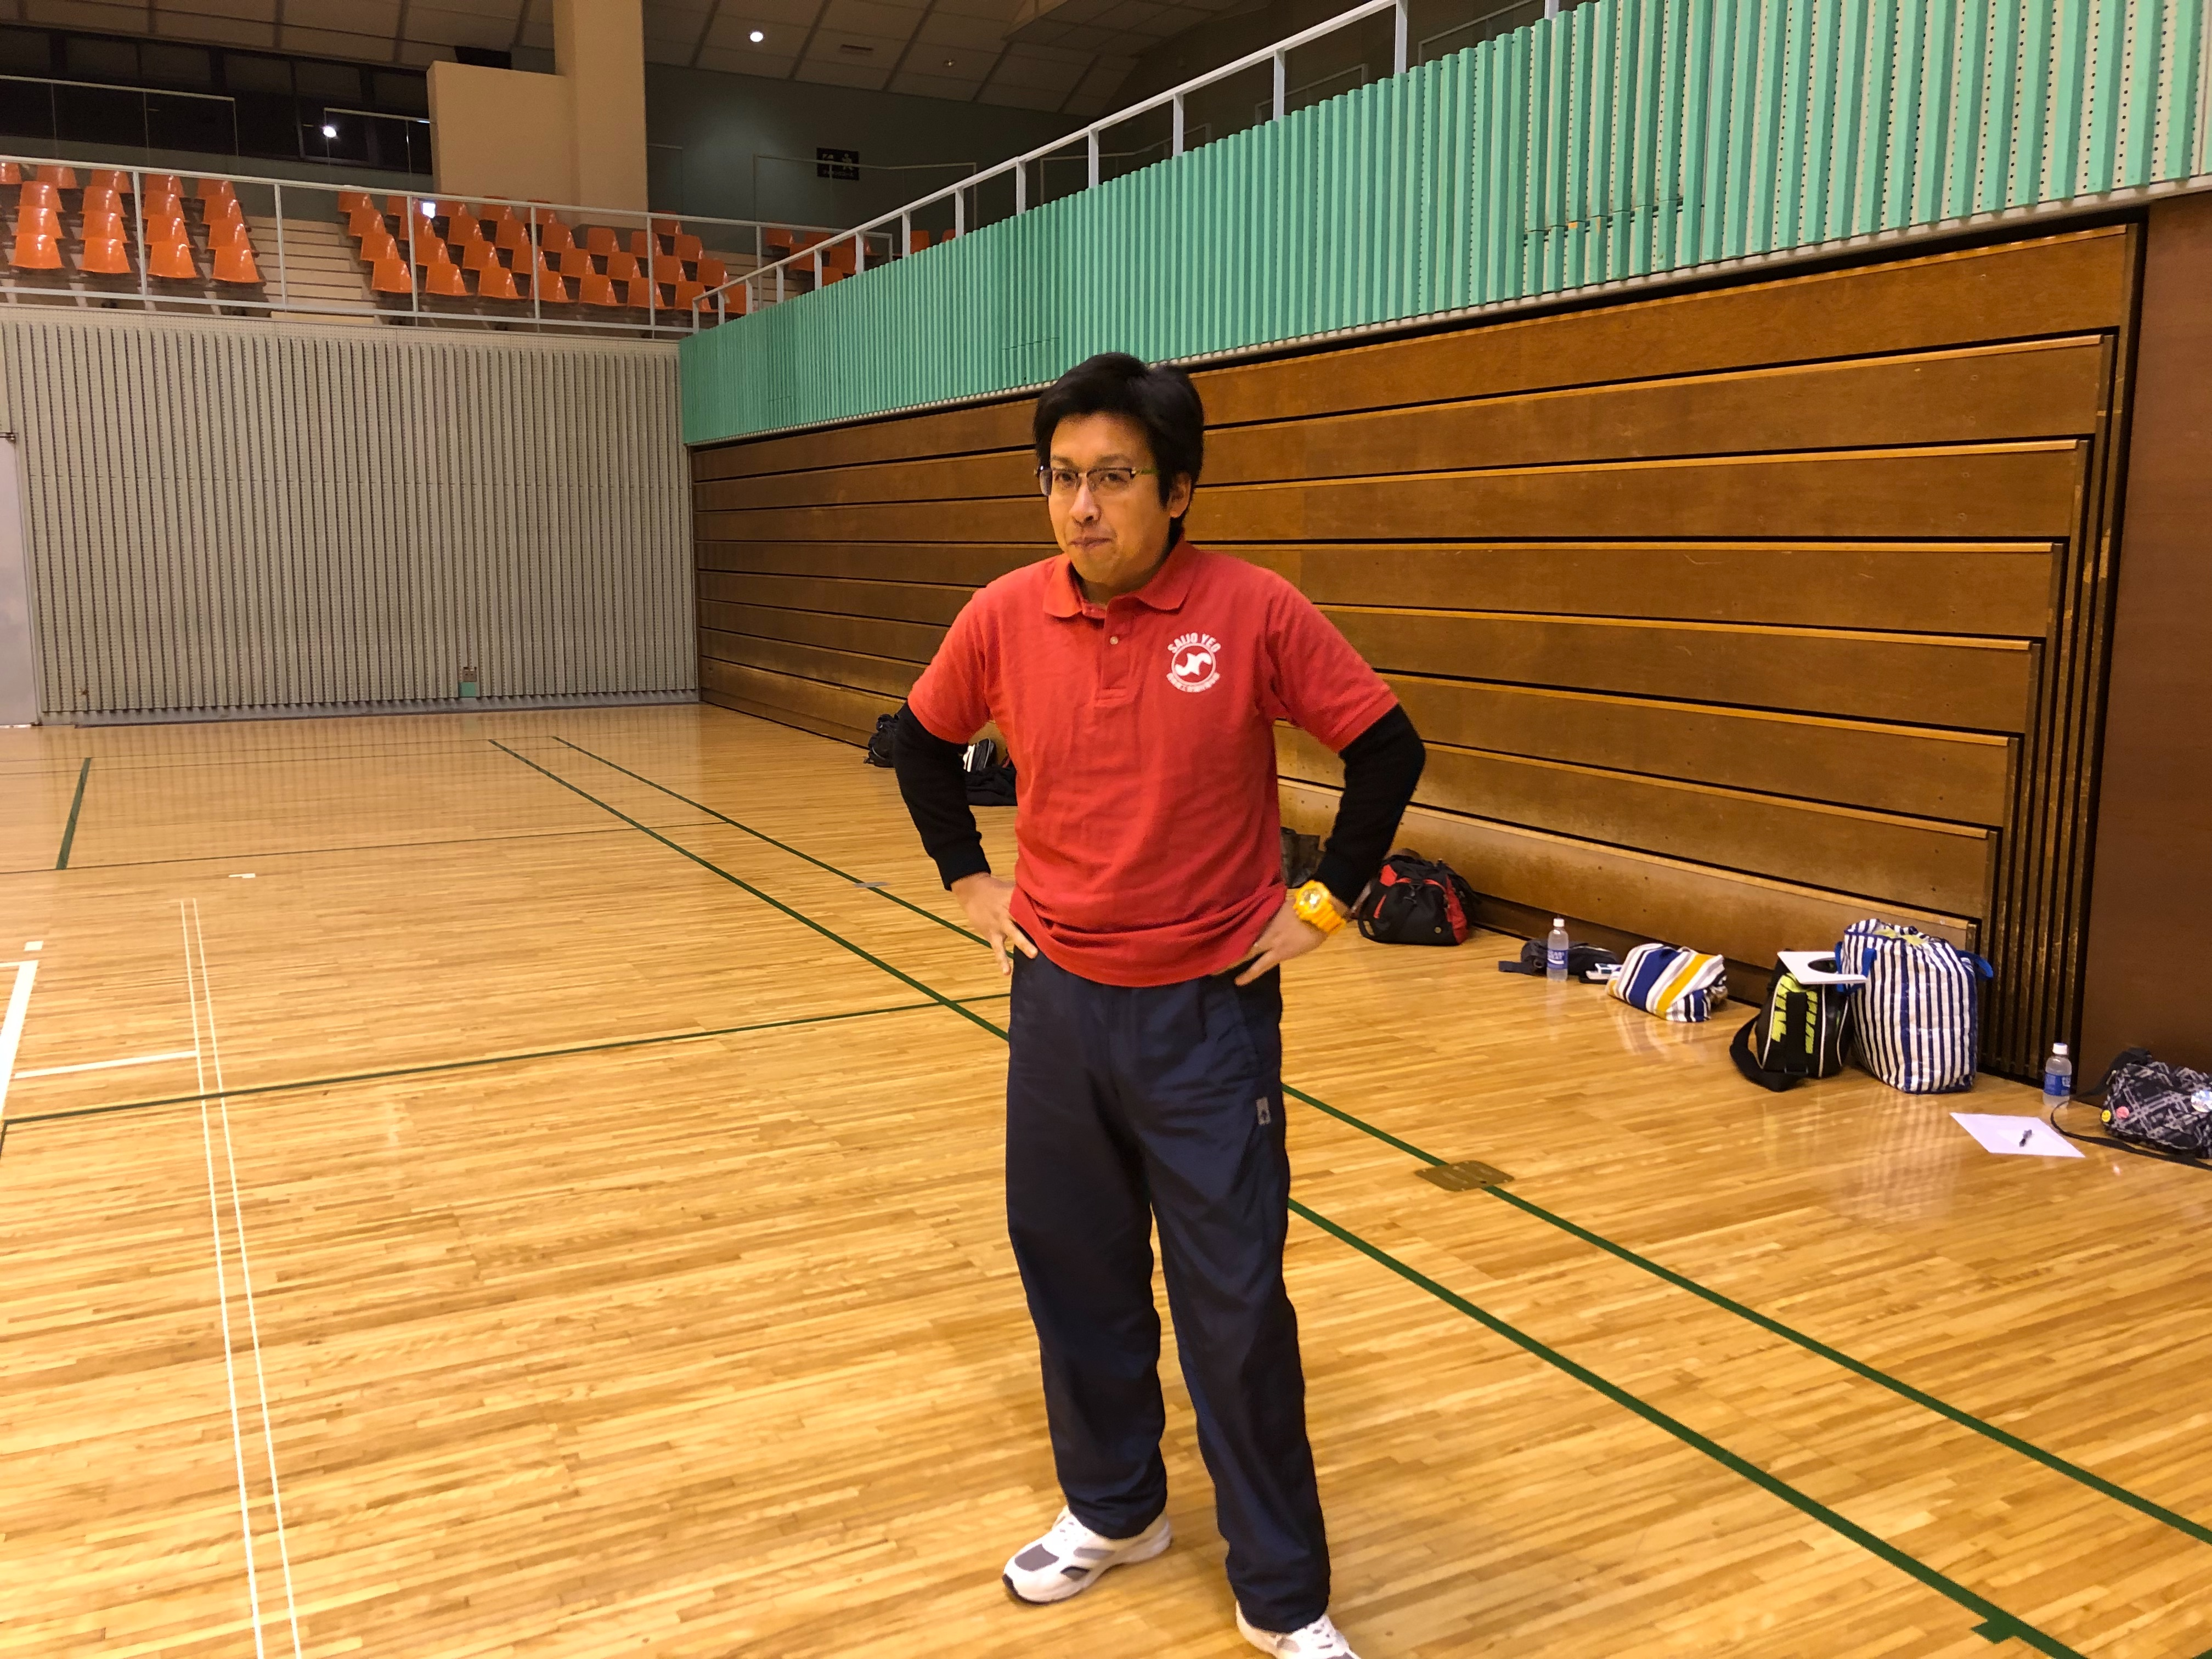 f:id:masanori-kato1972:20190322110812j:image